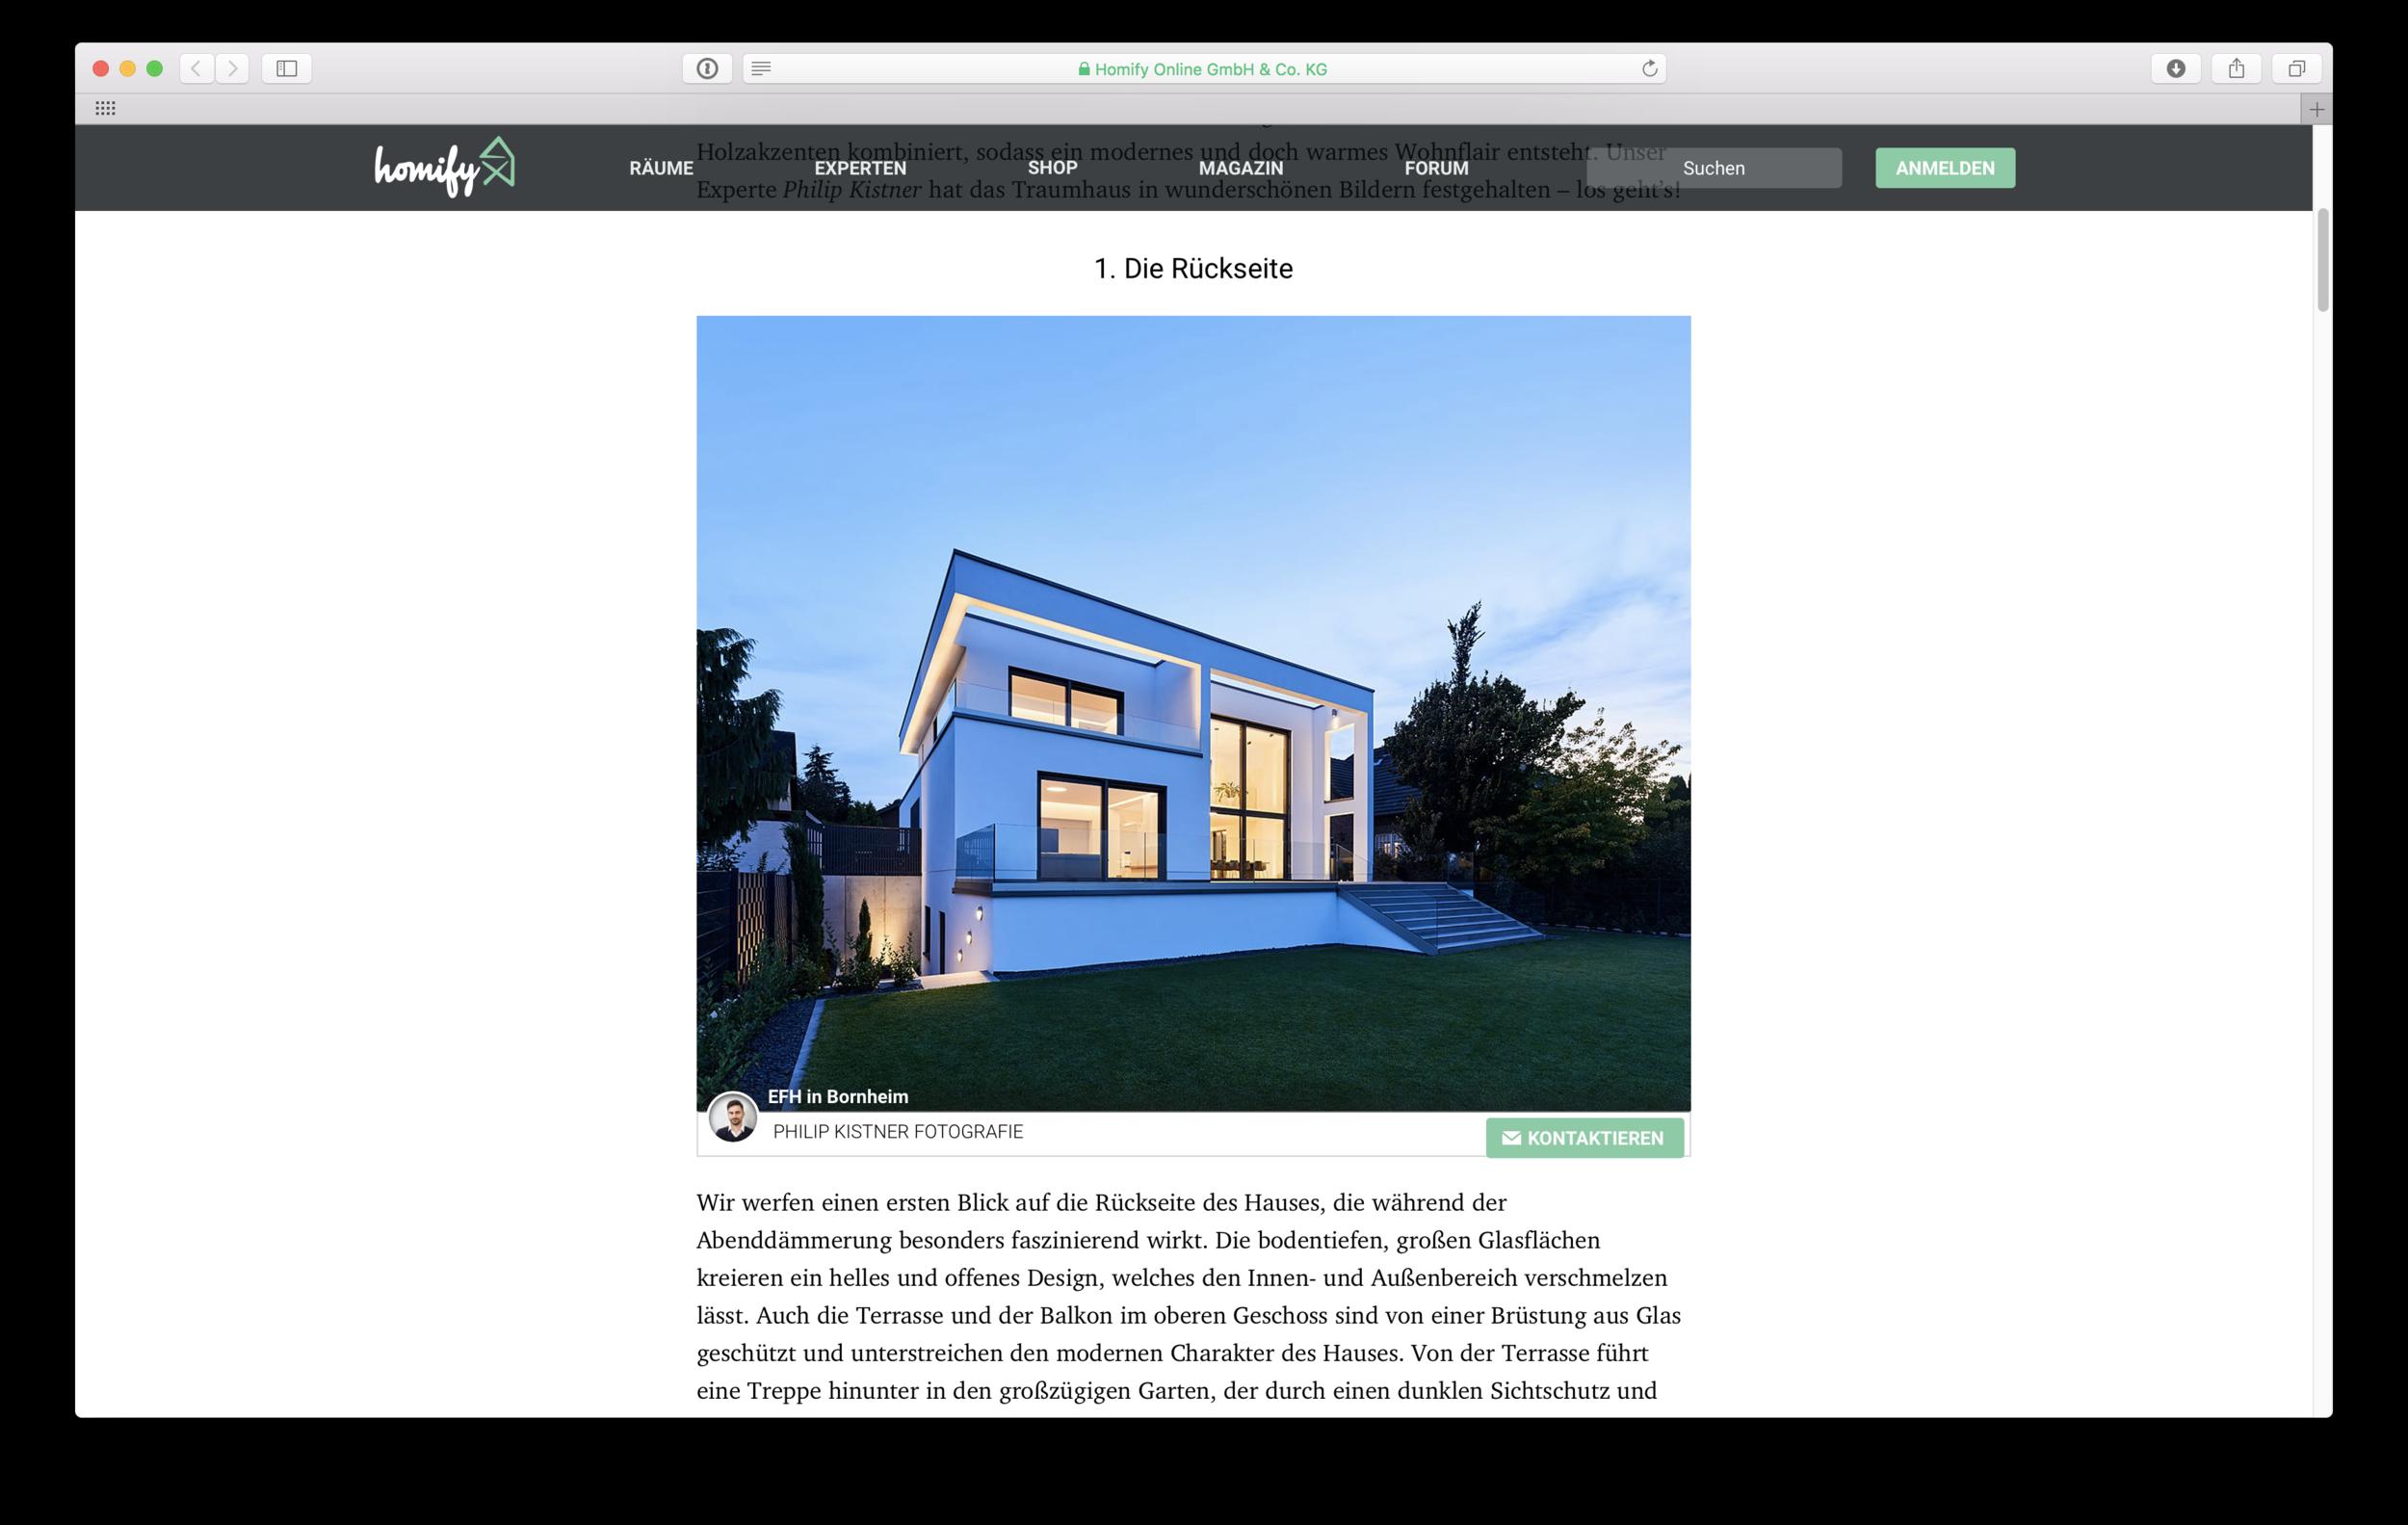 Architekturfotografie-Bornheim-Philip Kistner.png